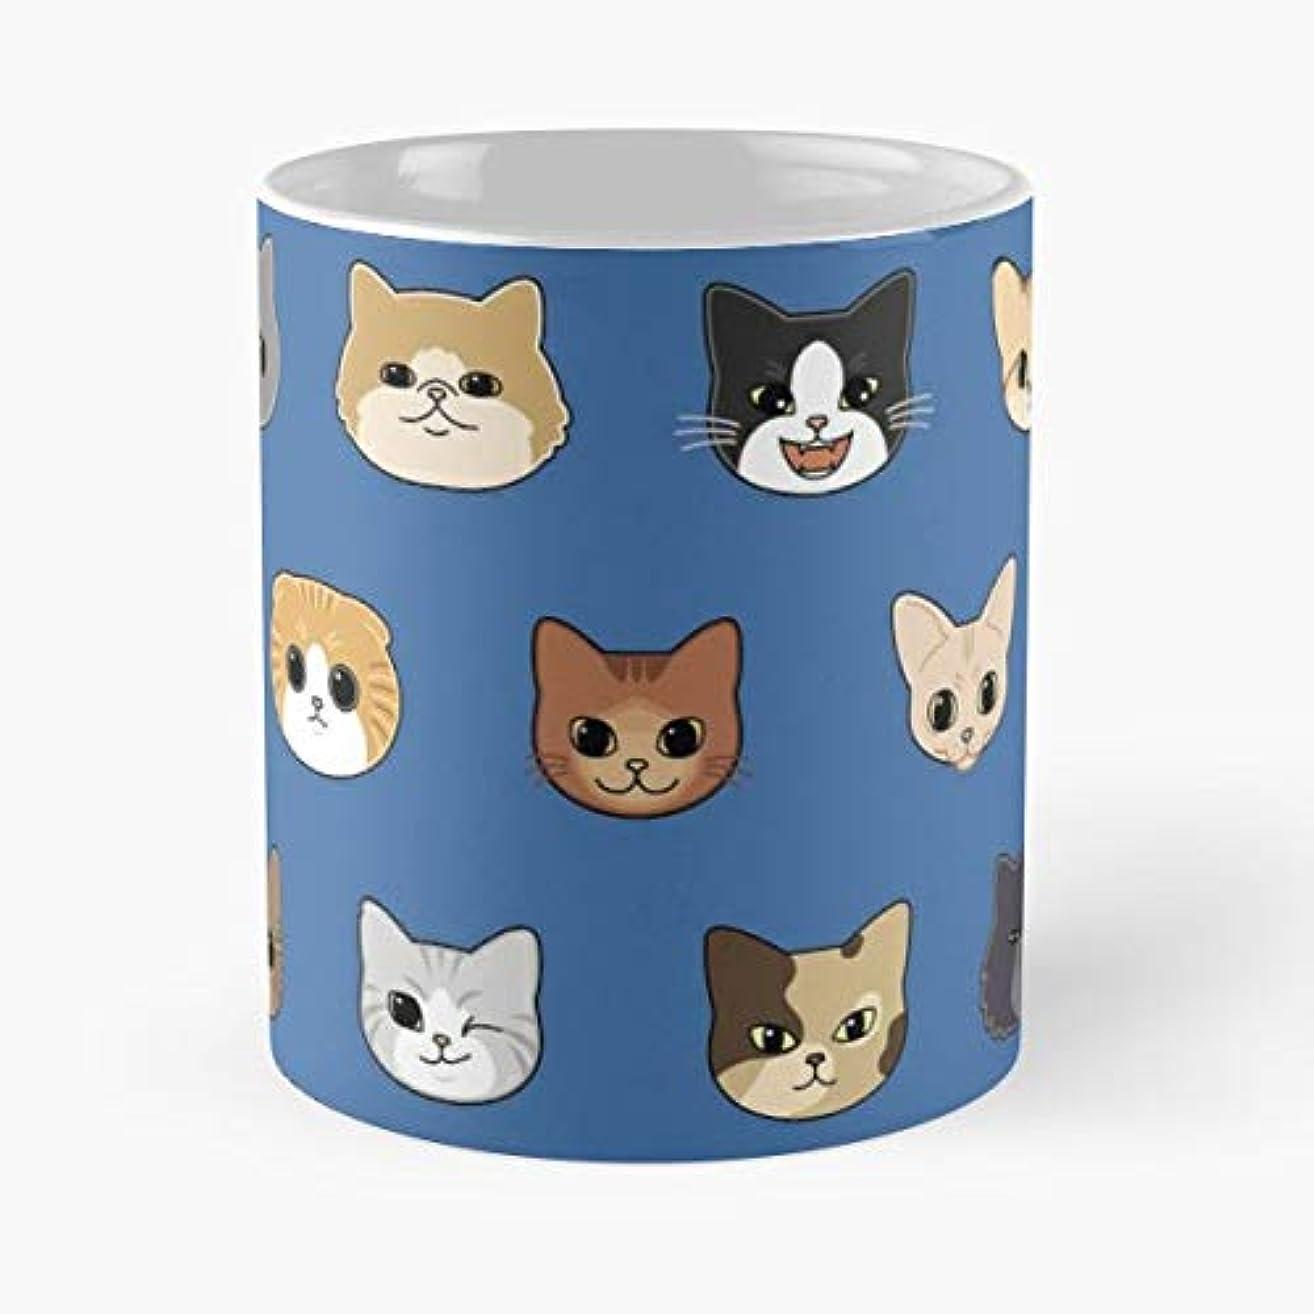 Cat Neko Kitty Kitten -funny Gifts For Men And Women Gift Coffee Mug Tea Cup White-11 Oz.